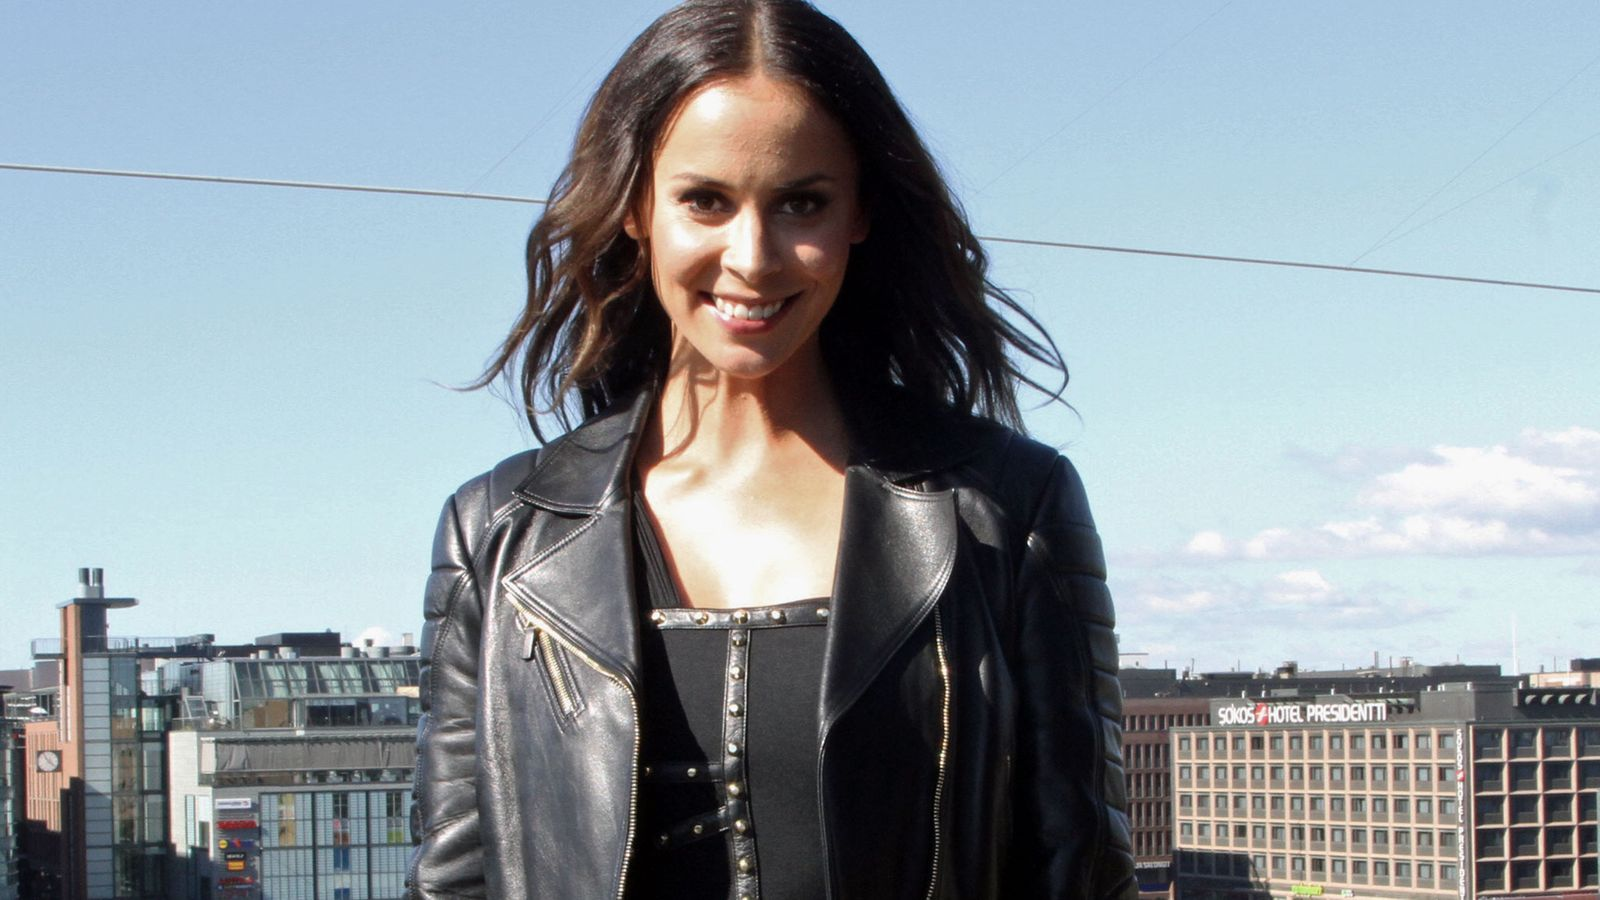 webcamporn suomen seksikkäin nainen